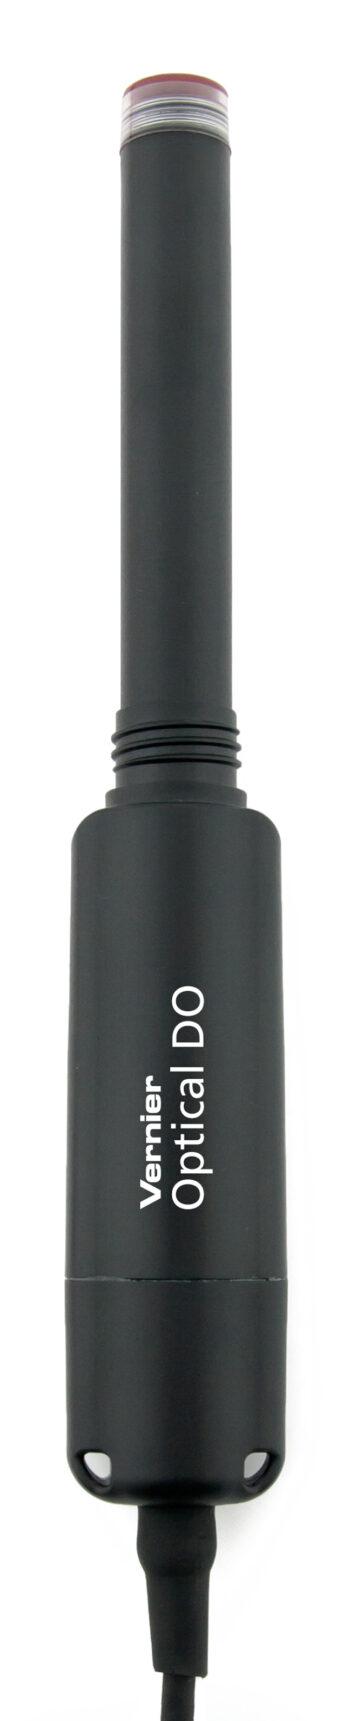 Image of Vernier Optical DO Probe